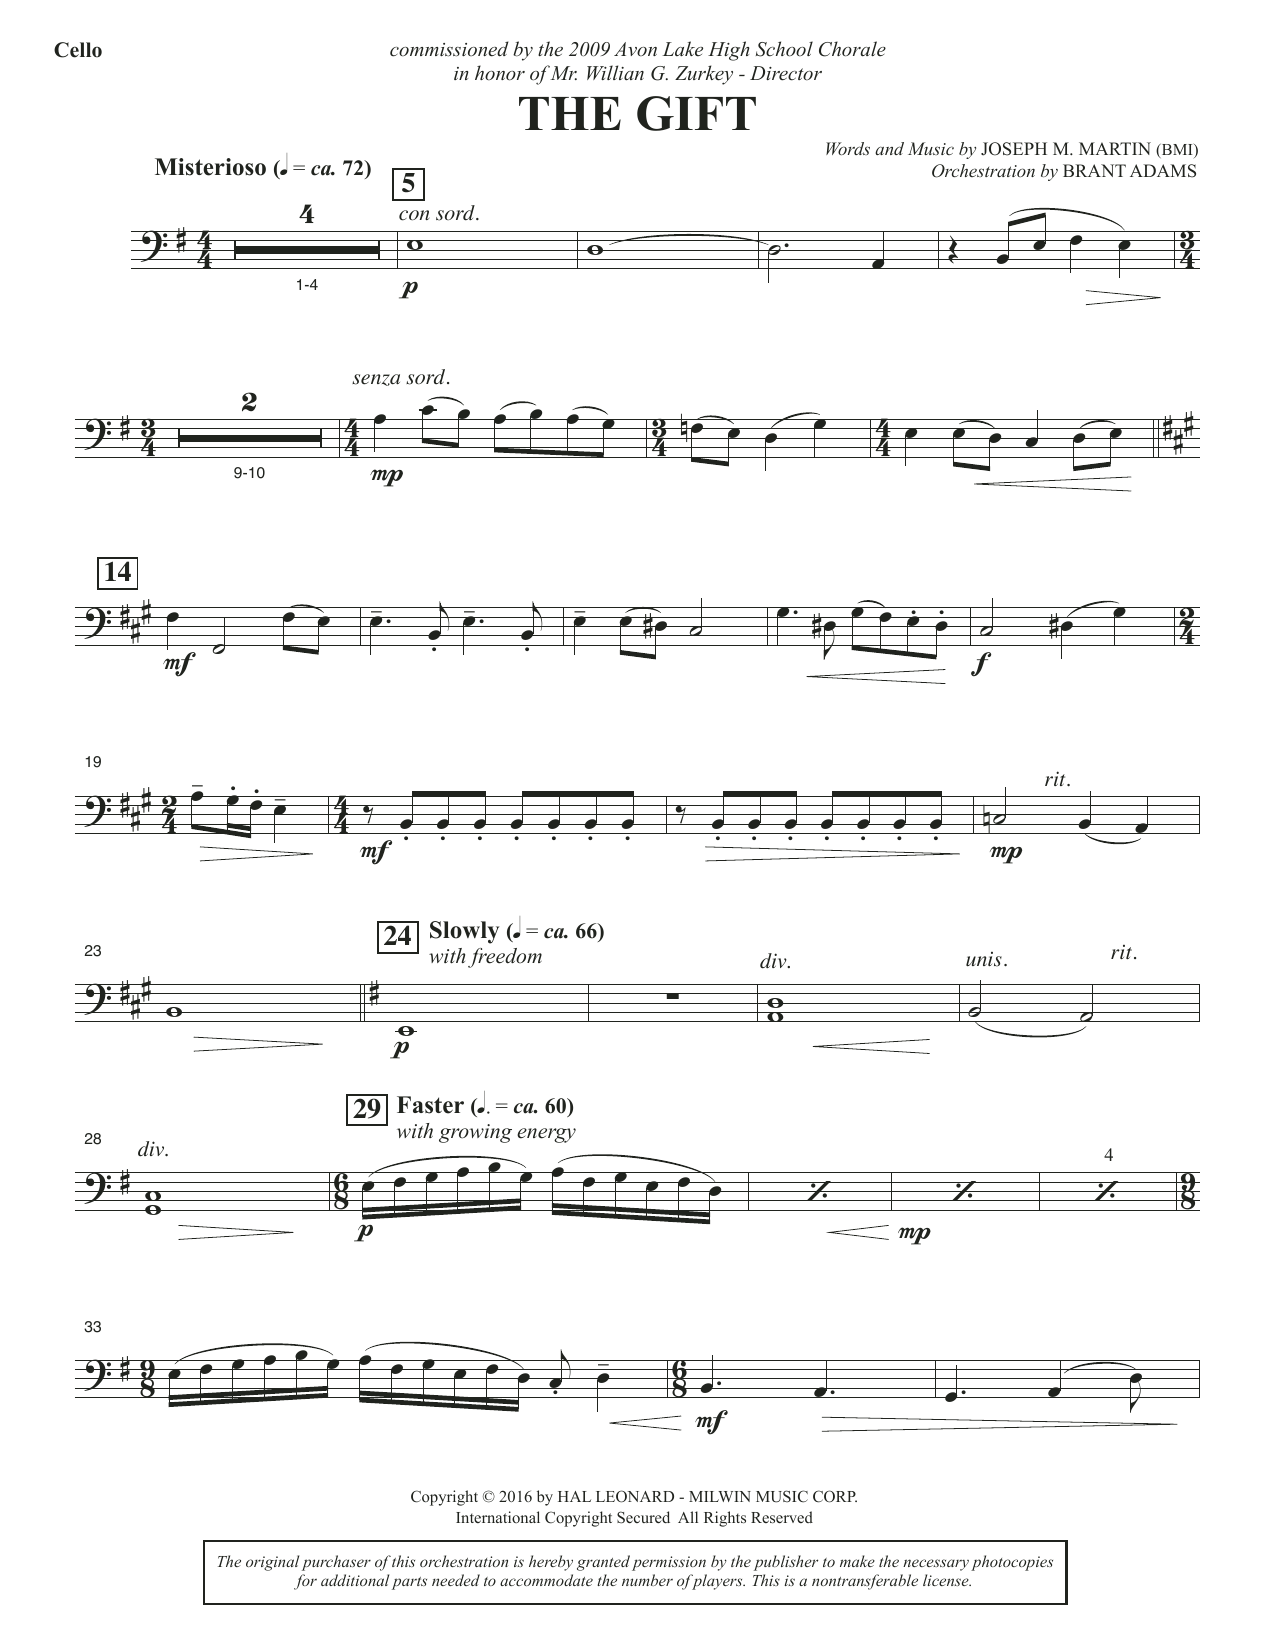 The Gift - Cello Sheet Music